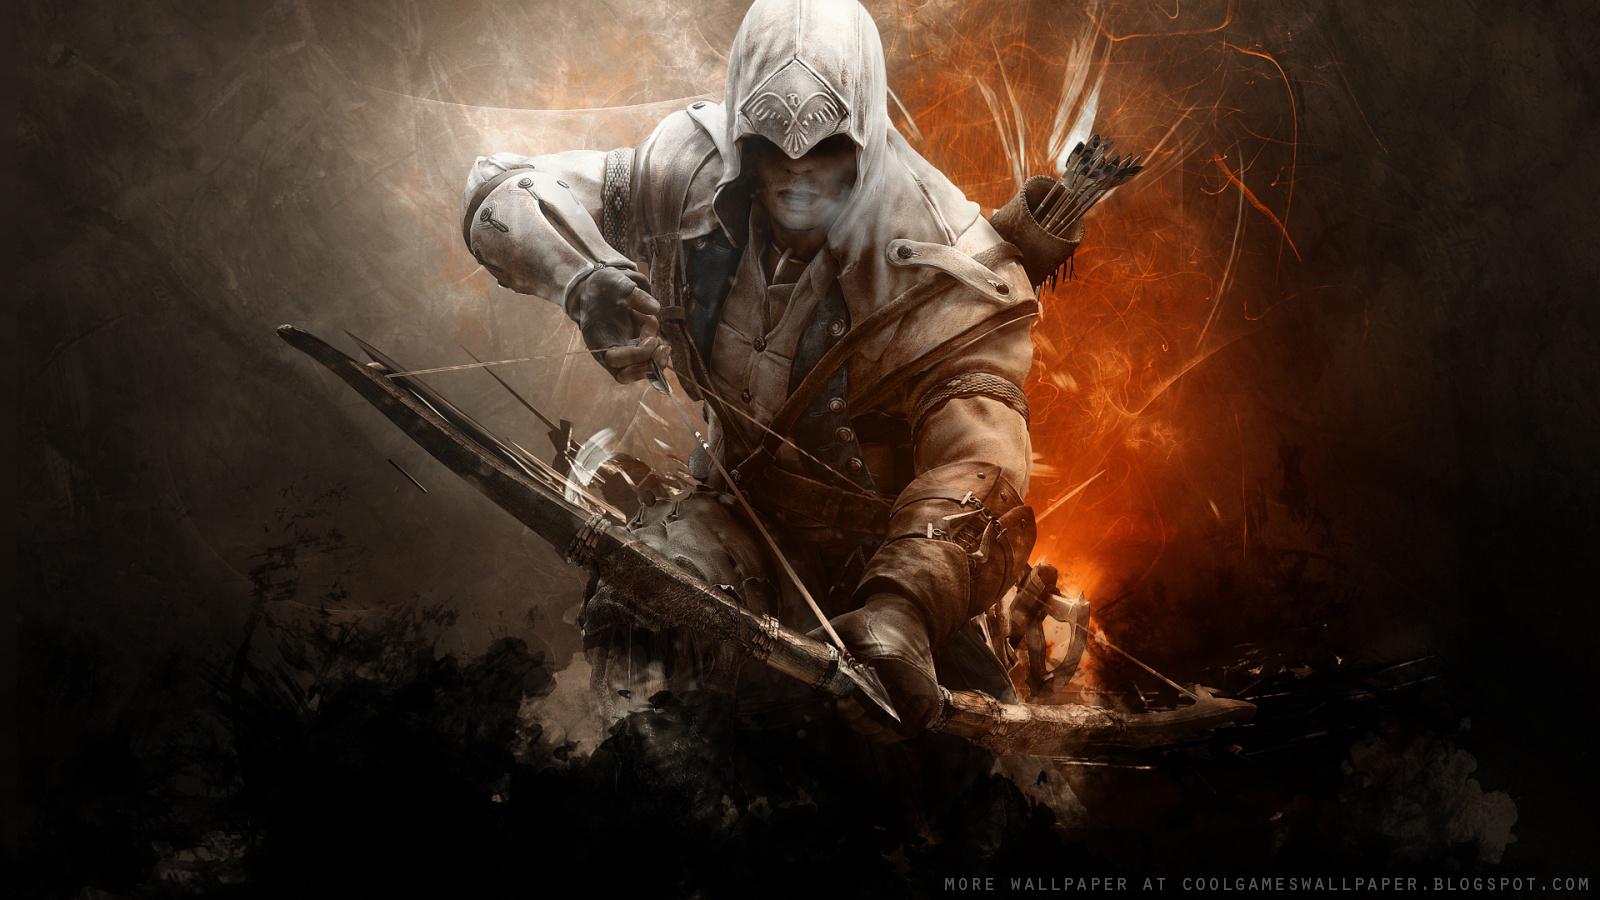 Assassin S Creed 3 Wallpaper 2 Cool Games Wallpaper